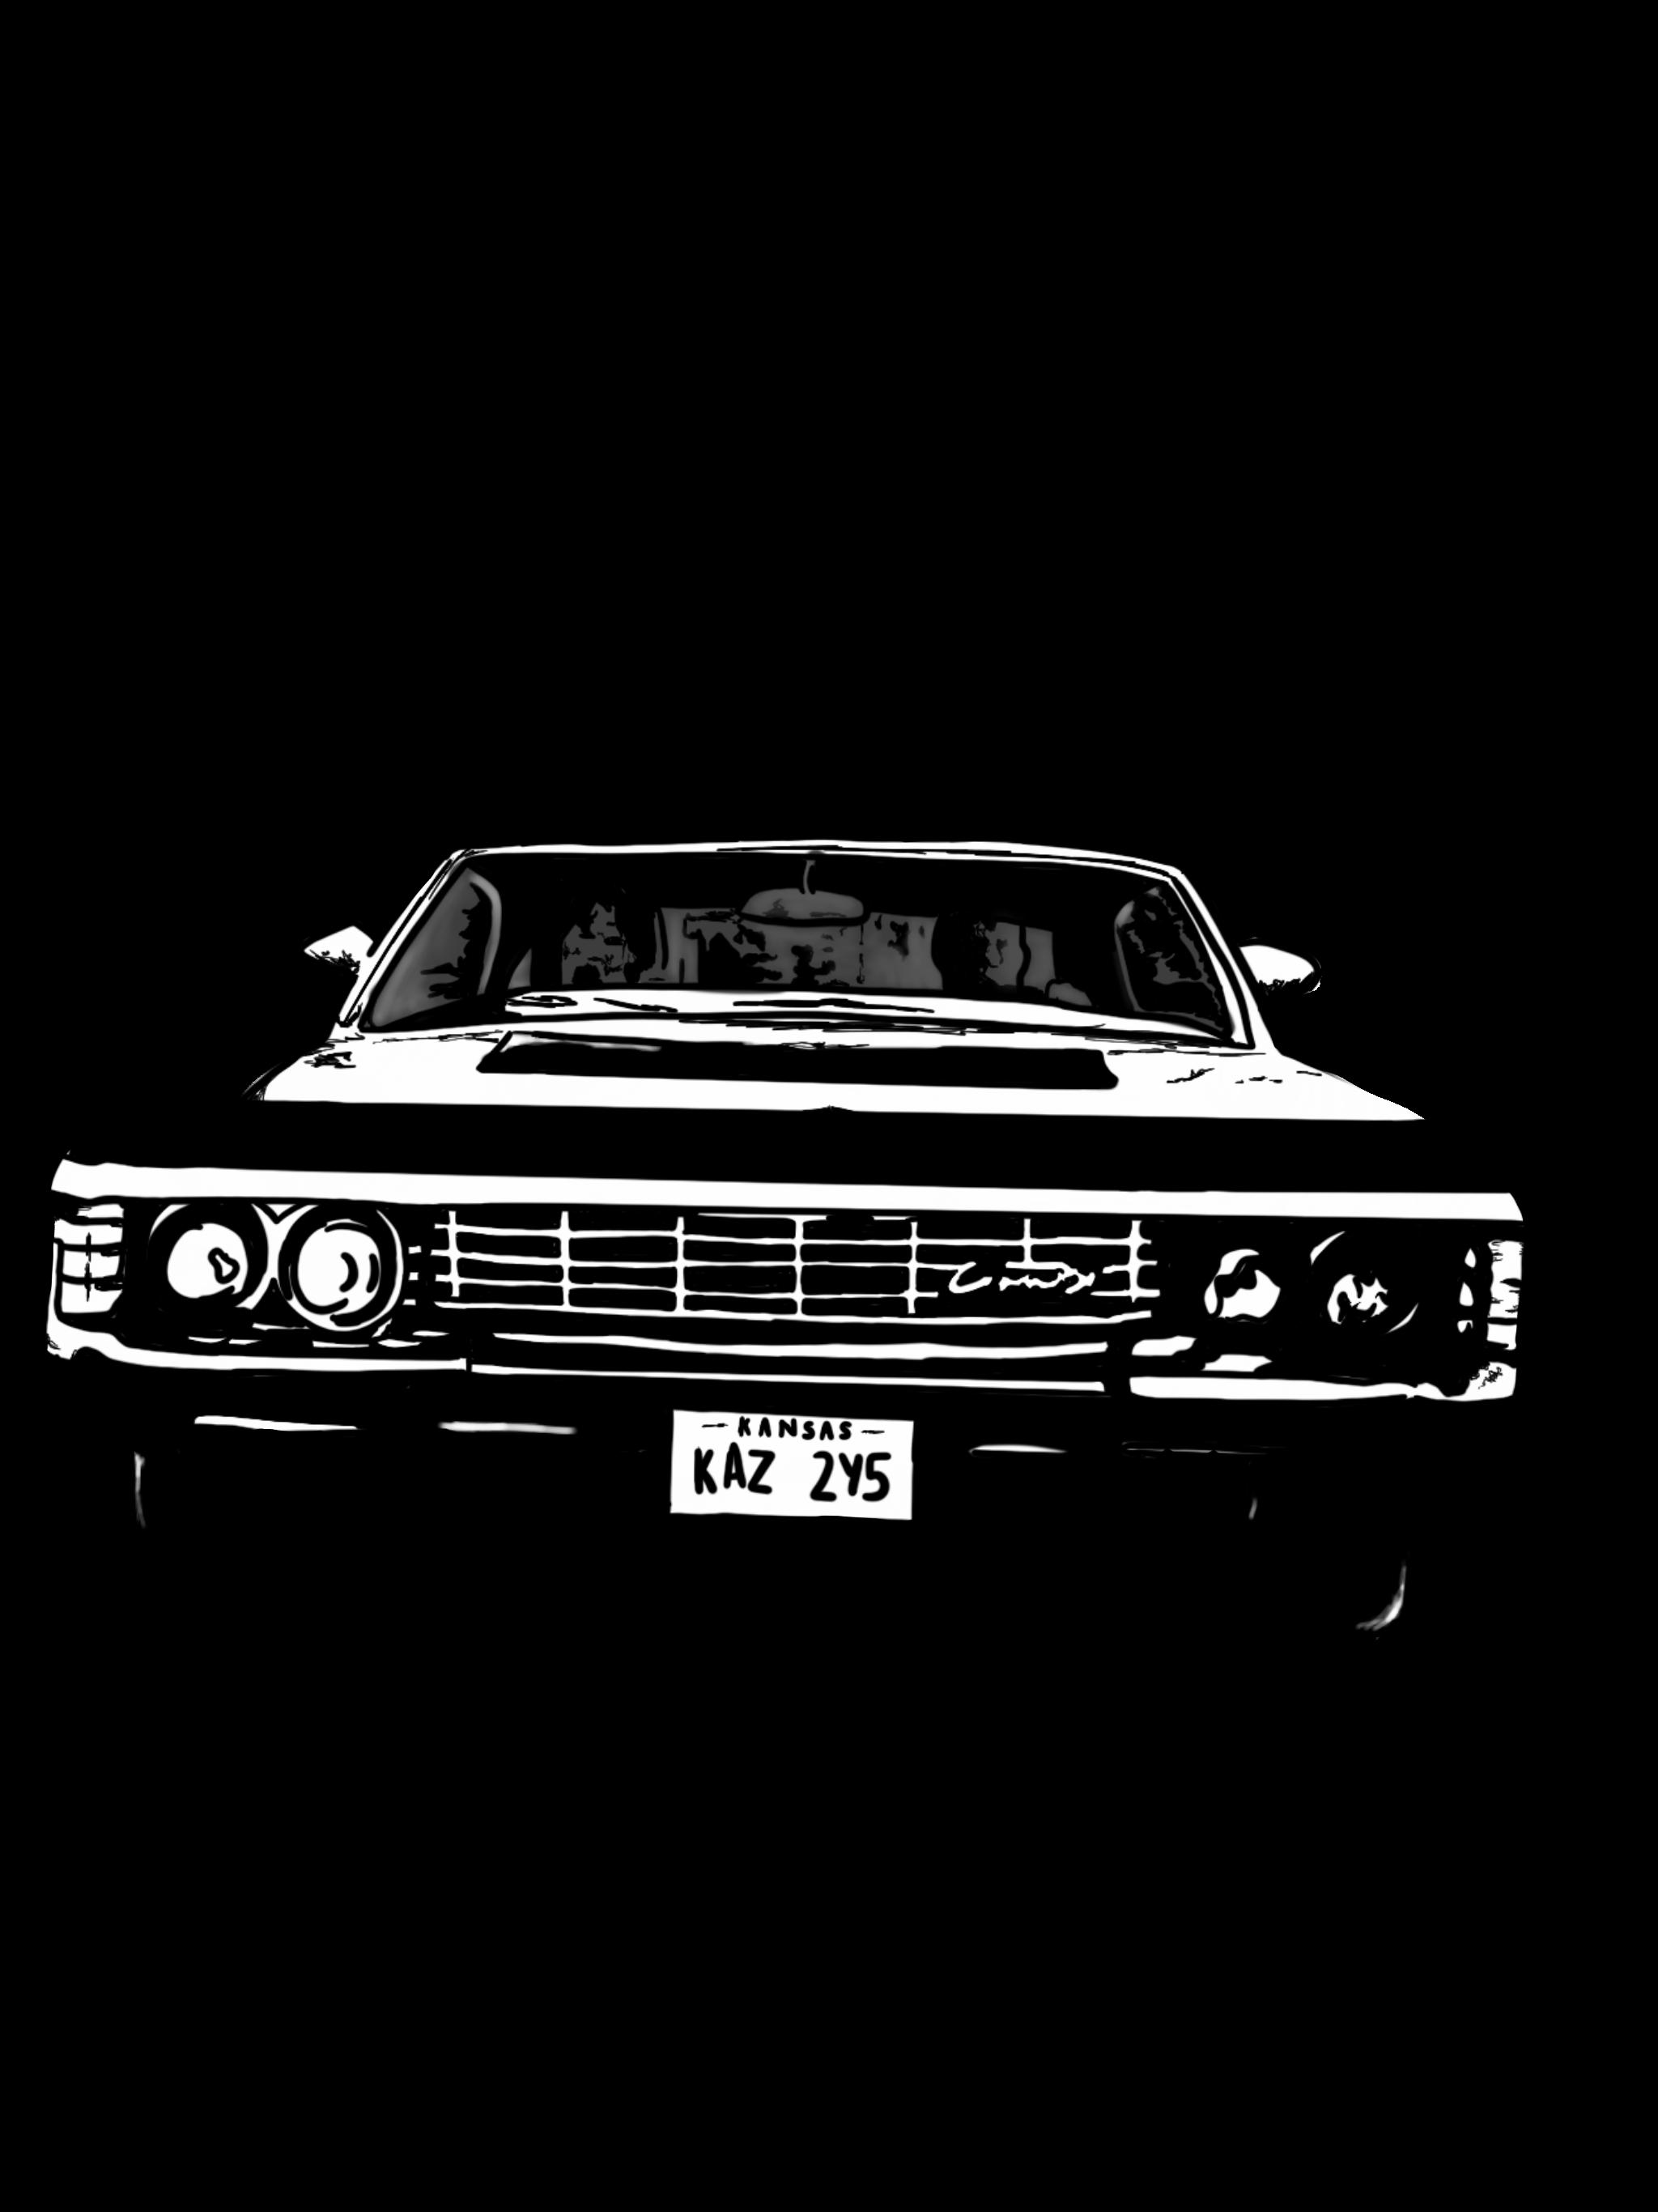 Supernatural car clipart graphic transparent 1967 Chevy Impala | My Art ❤ | Pinterest | 1967 chevy impala graphic transparent